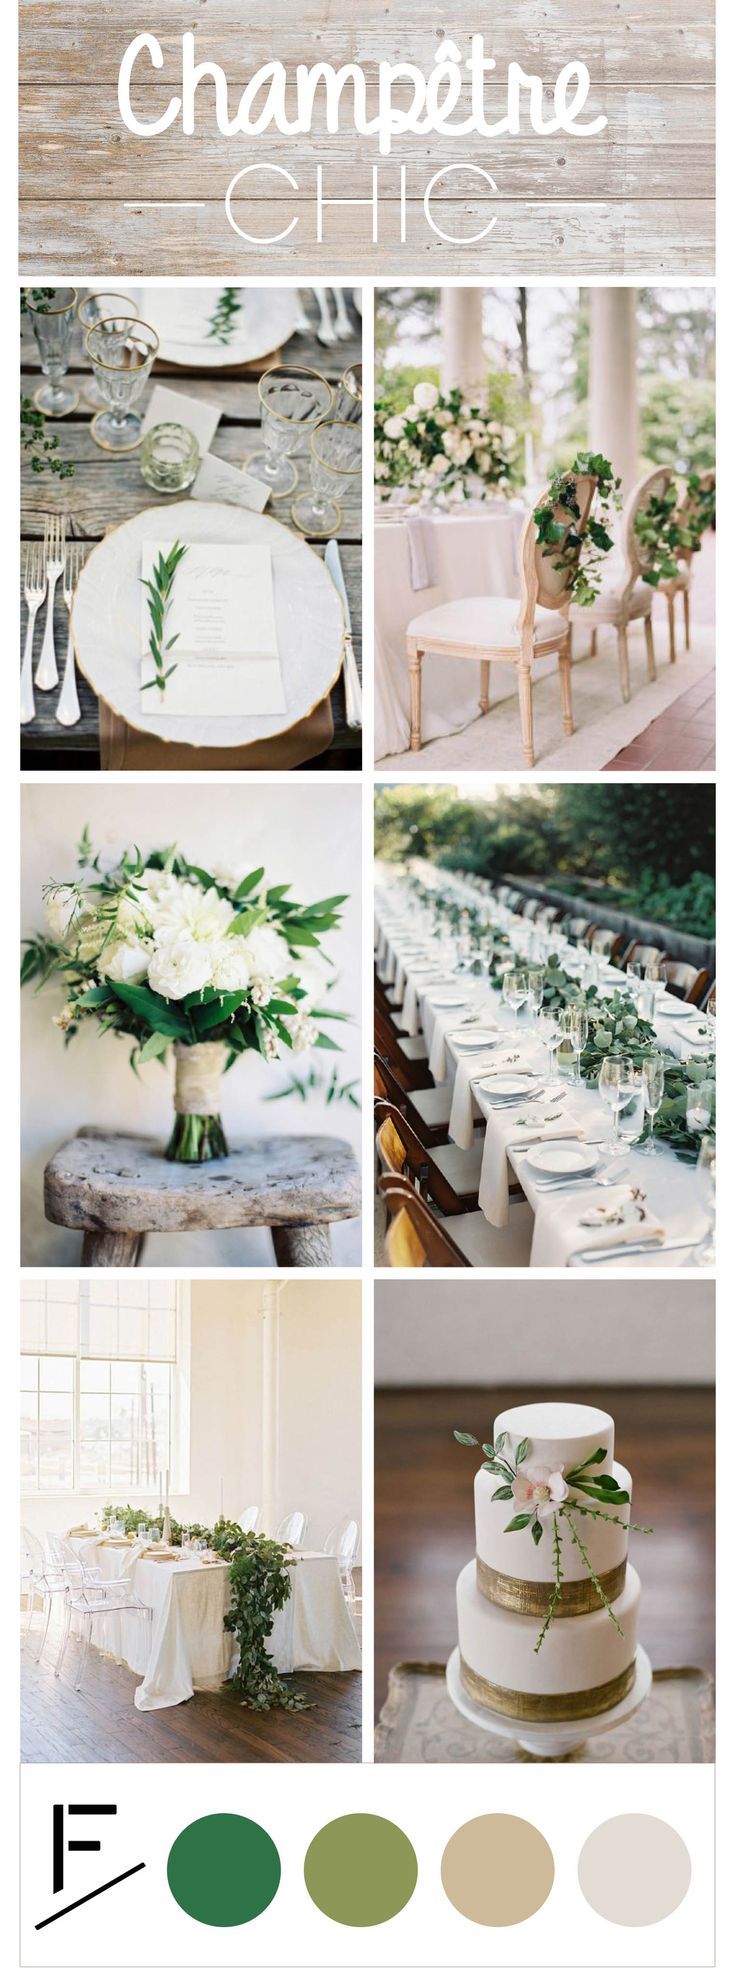 best 25 elegant table ideas on pinterest elegant table. Black Bedroom Furniture Sets. Home Design Ideas